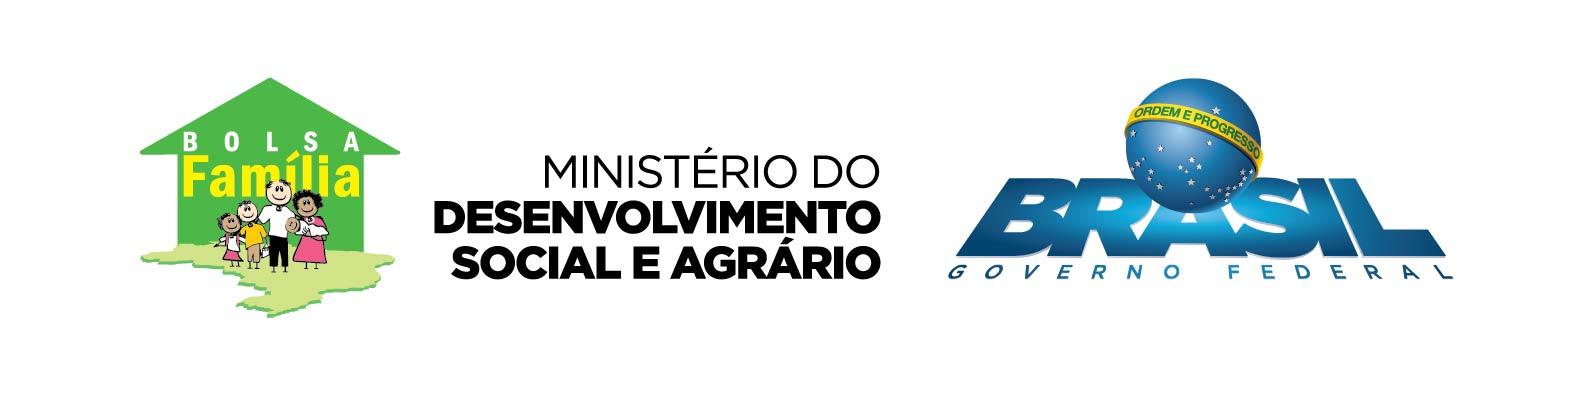 Beneficiários Programa Bolsa Família - MARÇO 2018